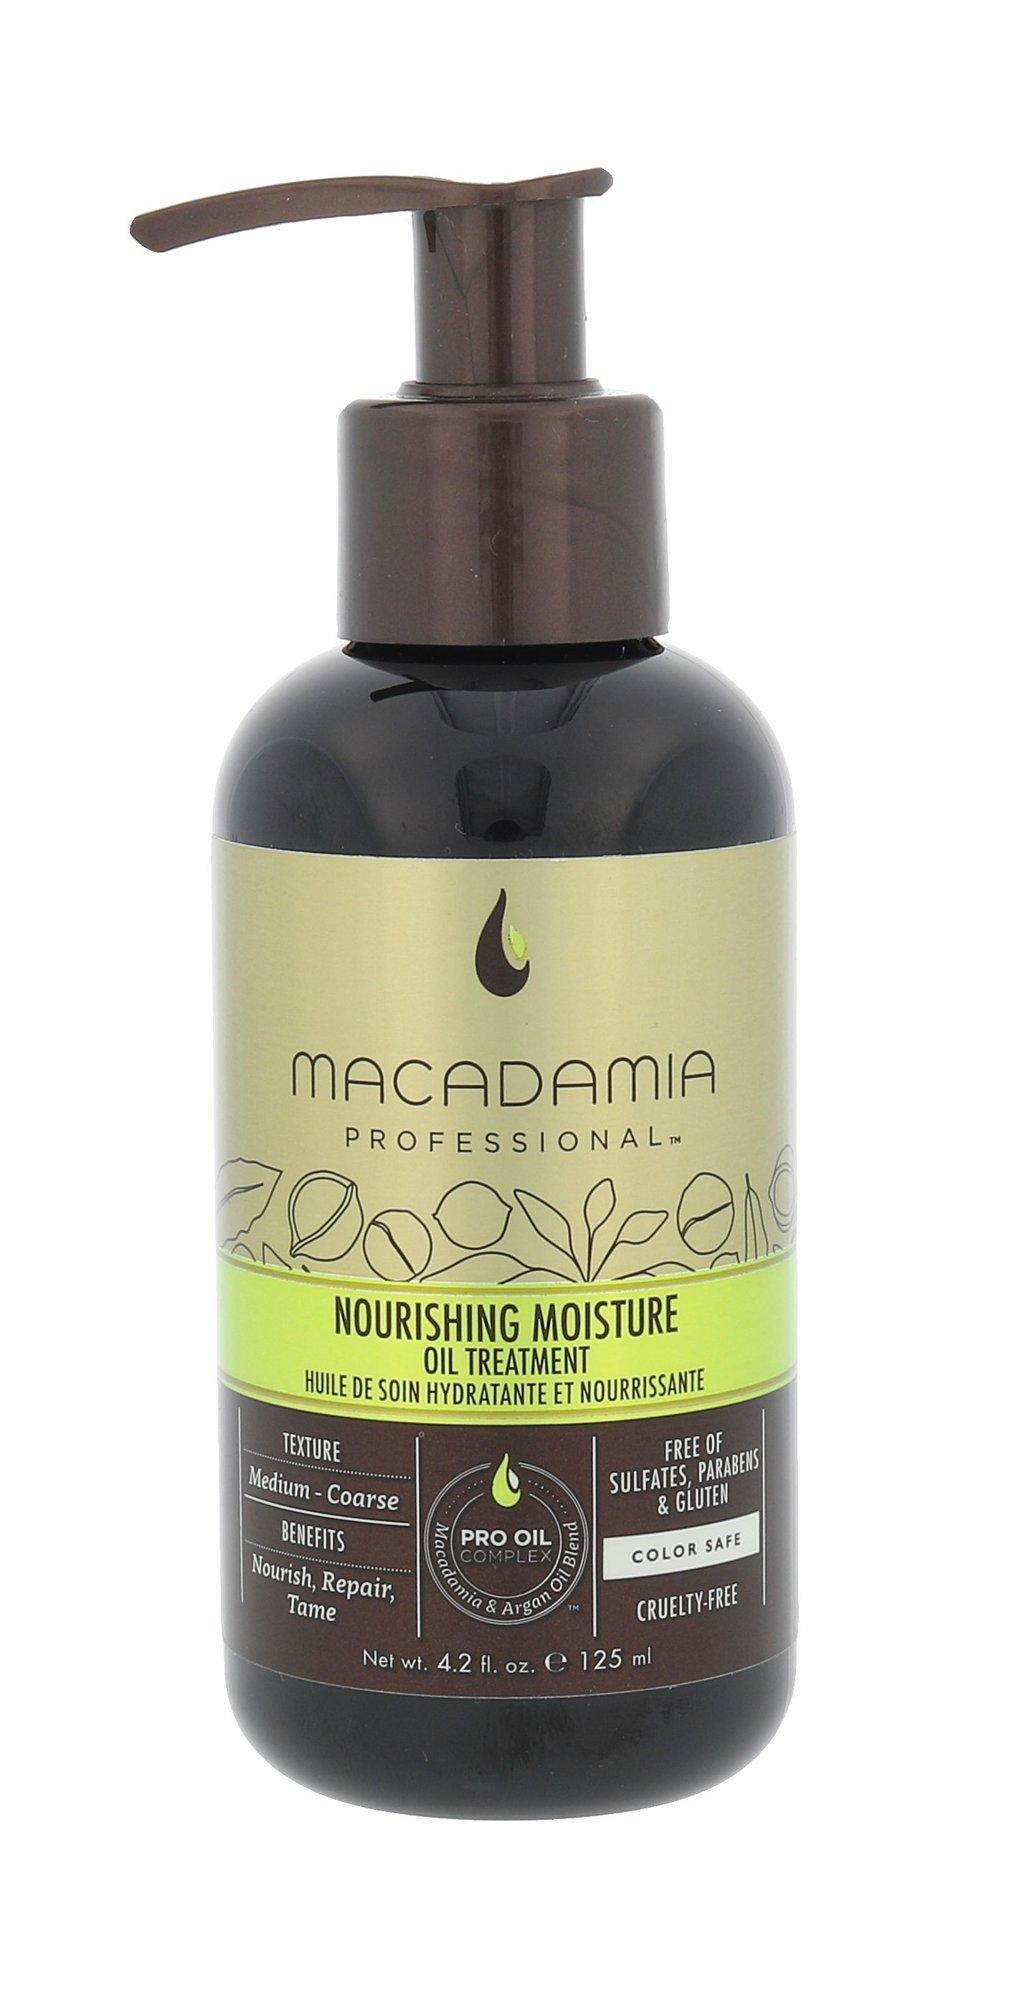 Macadamia Professional Nourishing Moisture Cosmetic 125ml